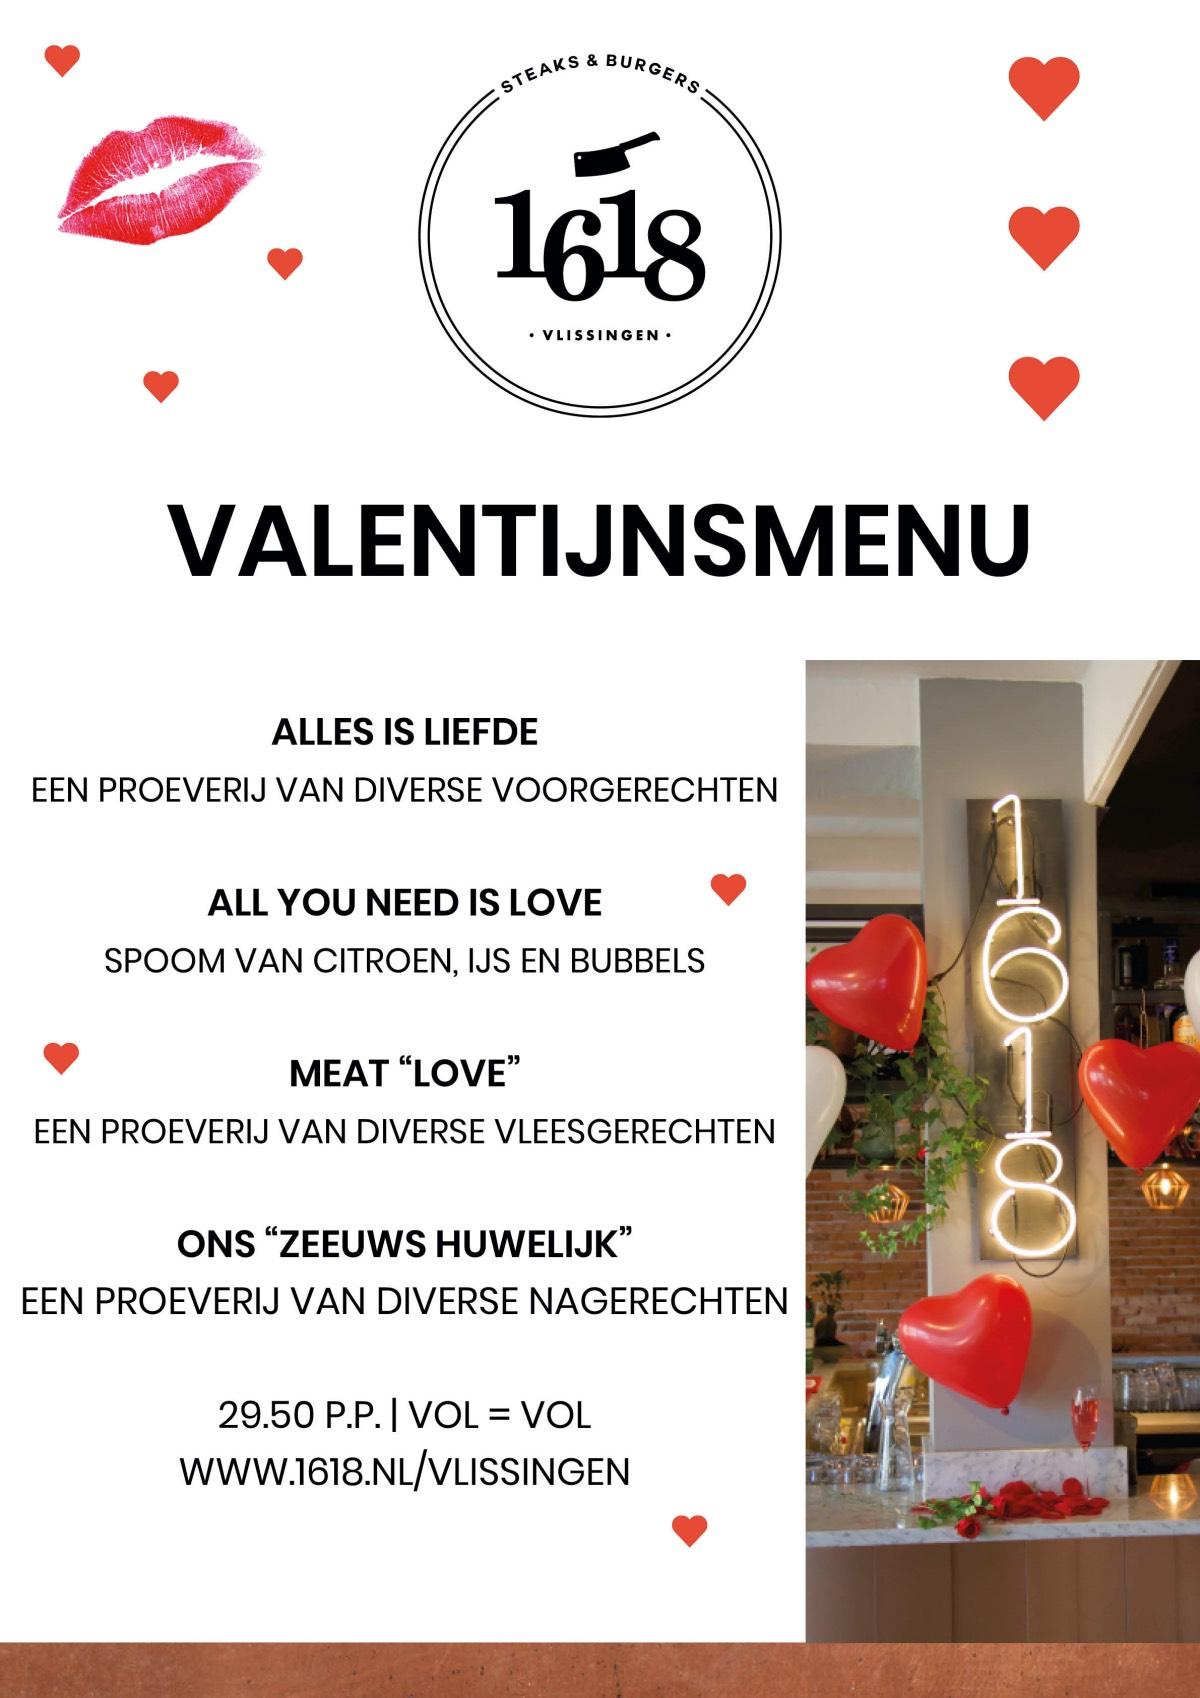 valentijnsmenu-v-2020_fotor